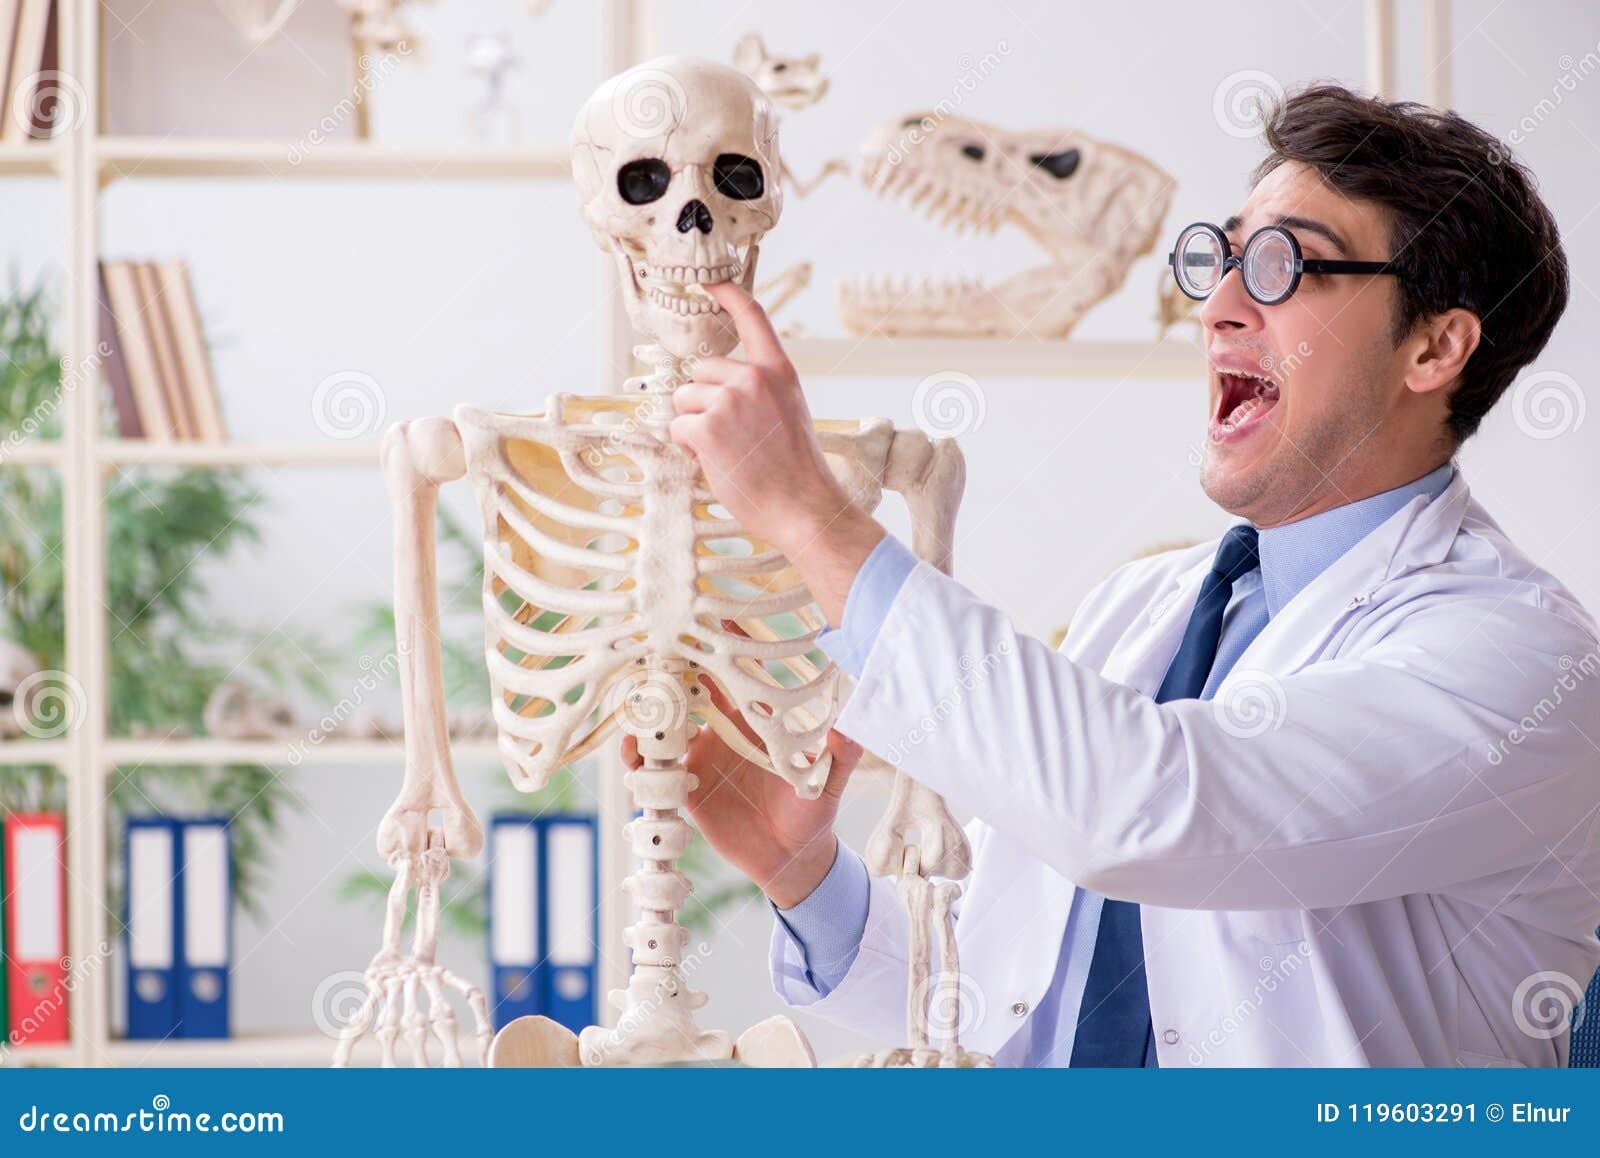 The crazy professor studying human skeleton